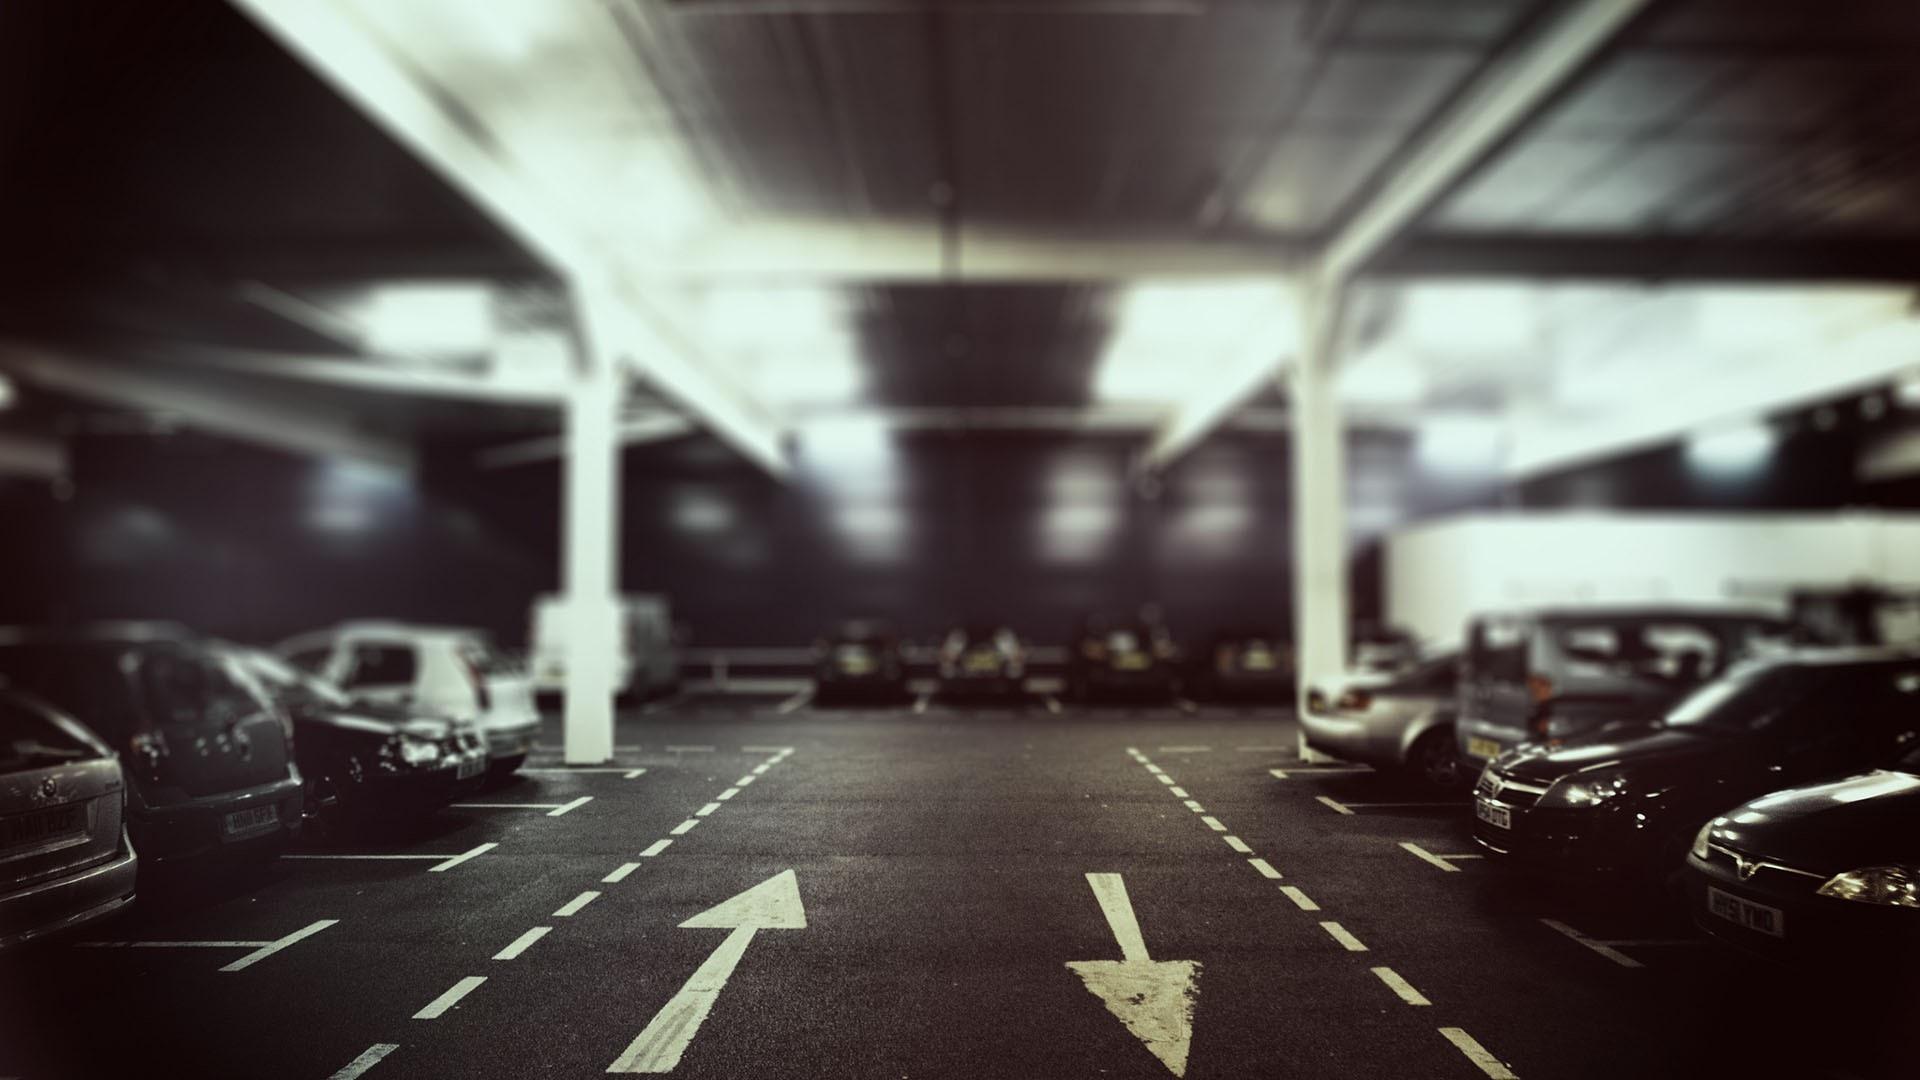 Parking Lot Wallpaper 39392 1920x1200 px